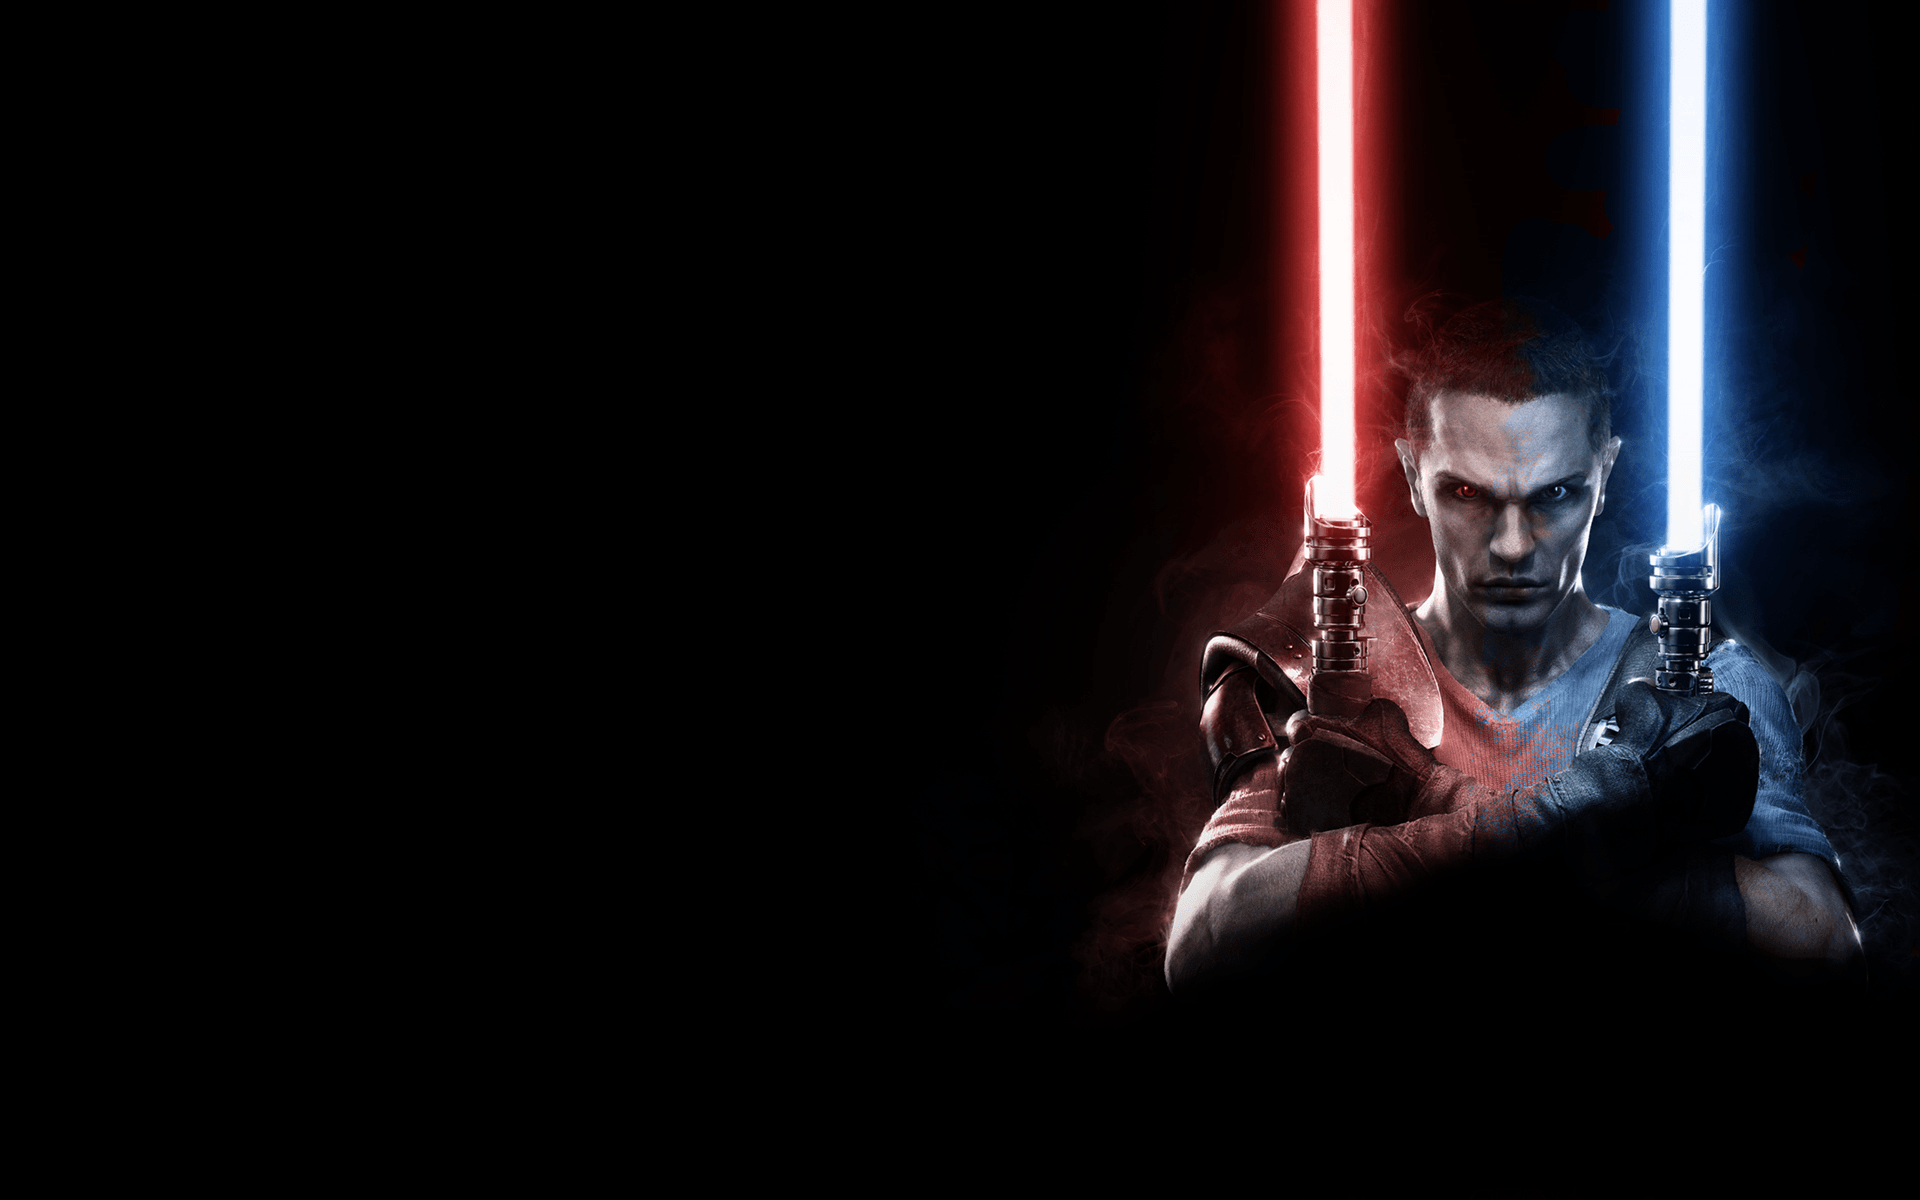 Star Wars Jedi Wallpapers Top Free Star Wars Jedi Backgrounds